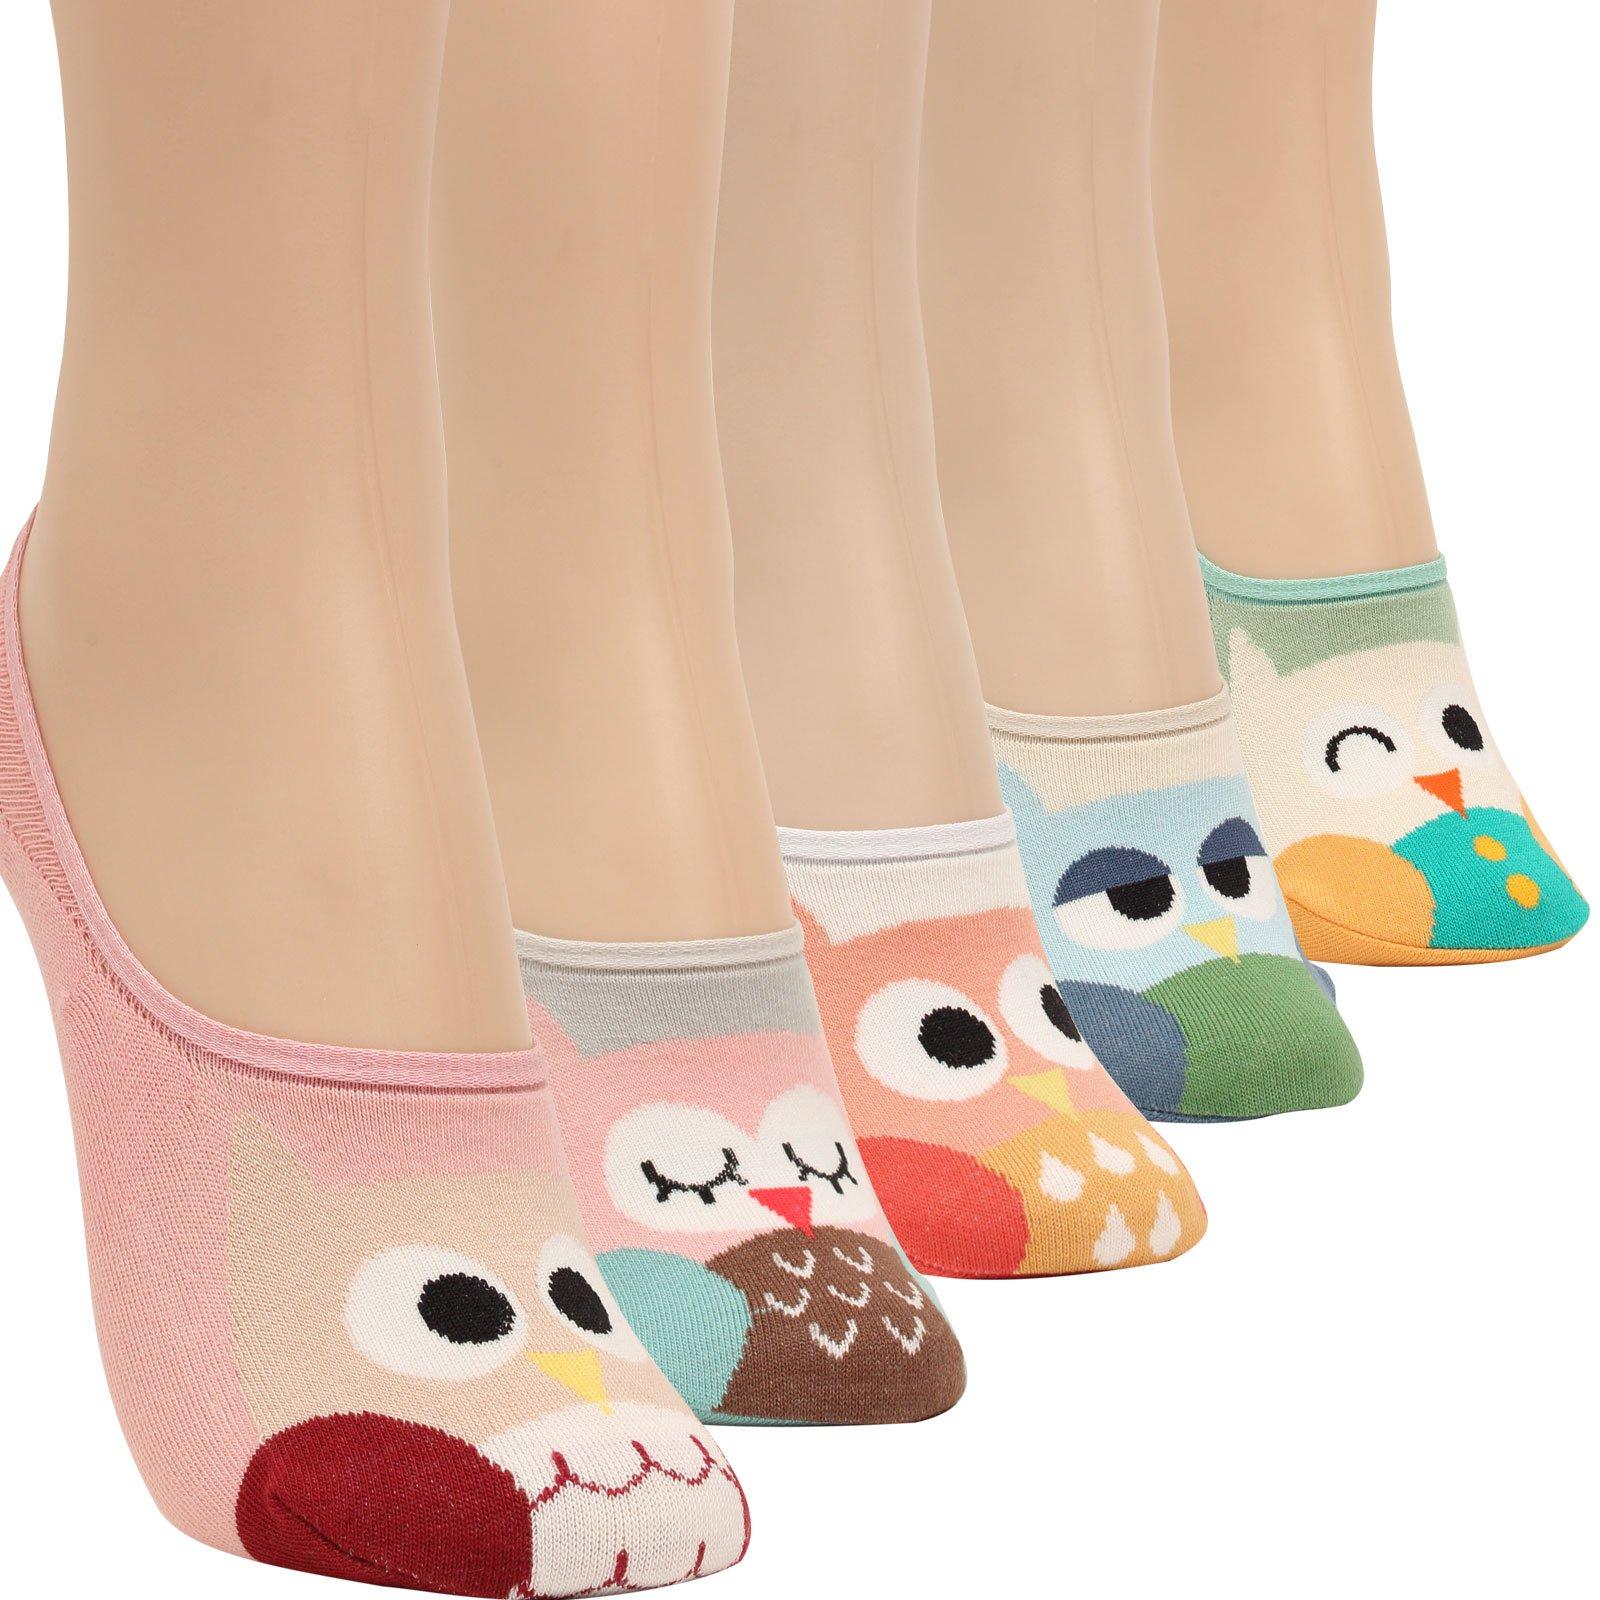 WOWFOOT Women Animal Design No-Show Casual Liner Socks Character Print Non Slip Flat Boat 4 Pair (5pair-owl)